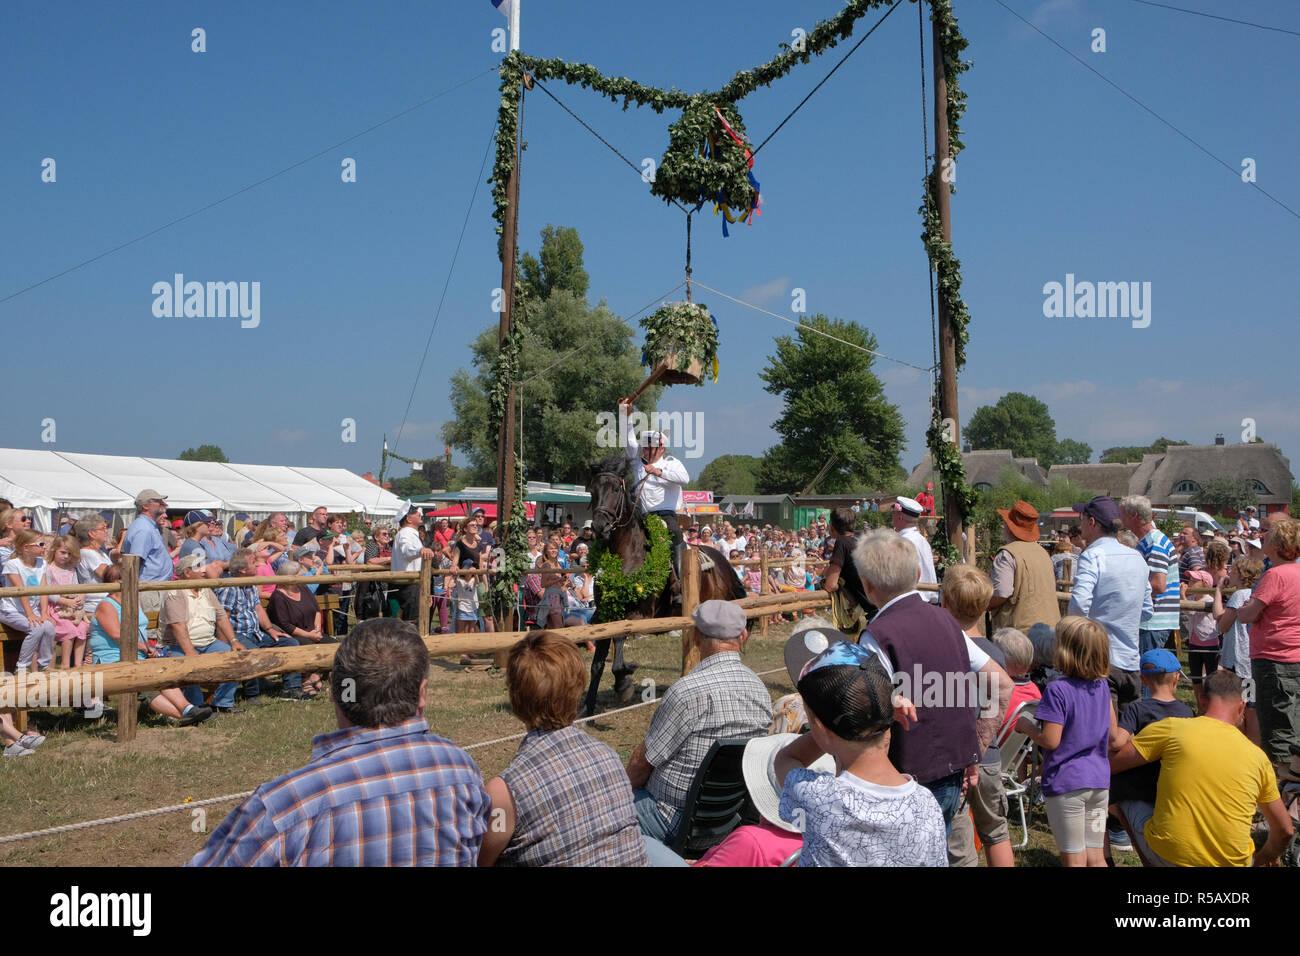 Tonnenabschlagen, fête populaire traditionnelle, Ahrenshoop, Fischland Darß-Zingst, Mecklenburg-Vorpommern, Allemagne Banque D'Images